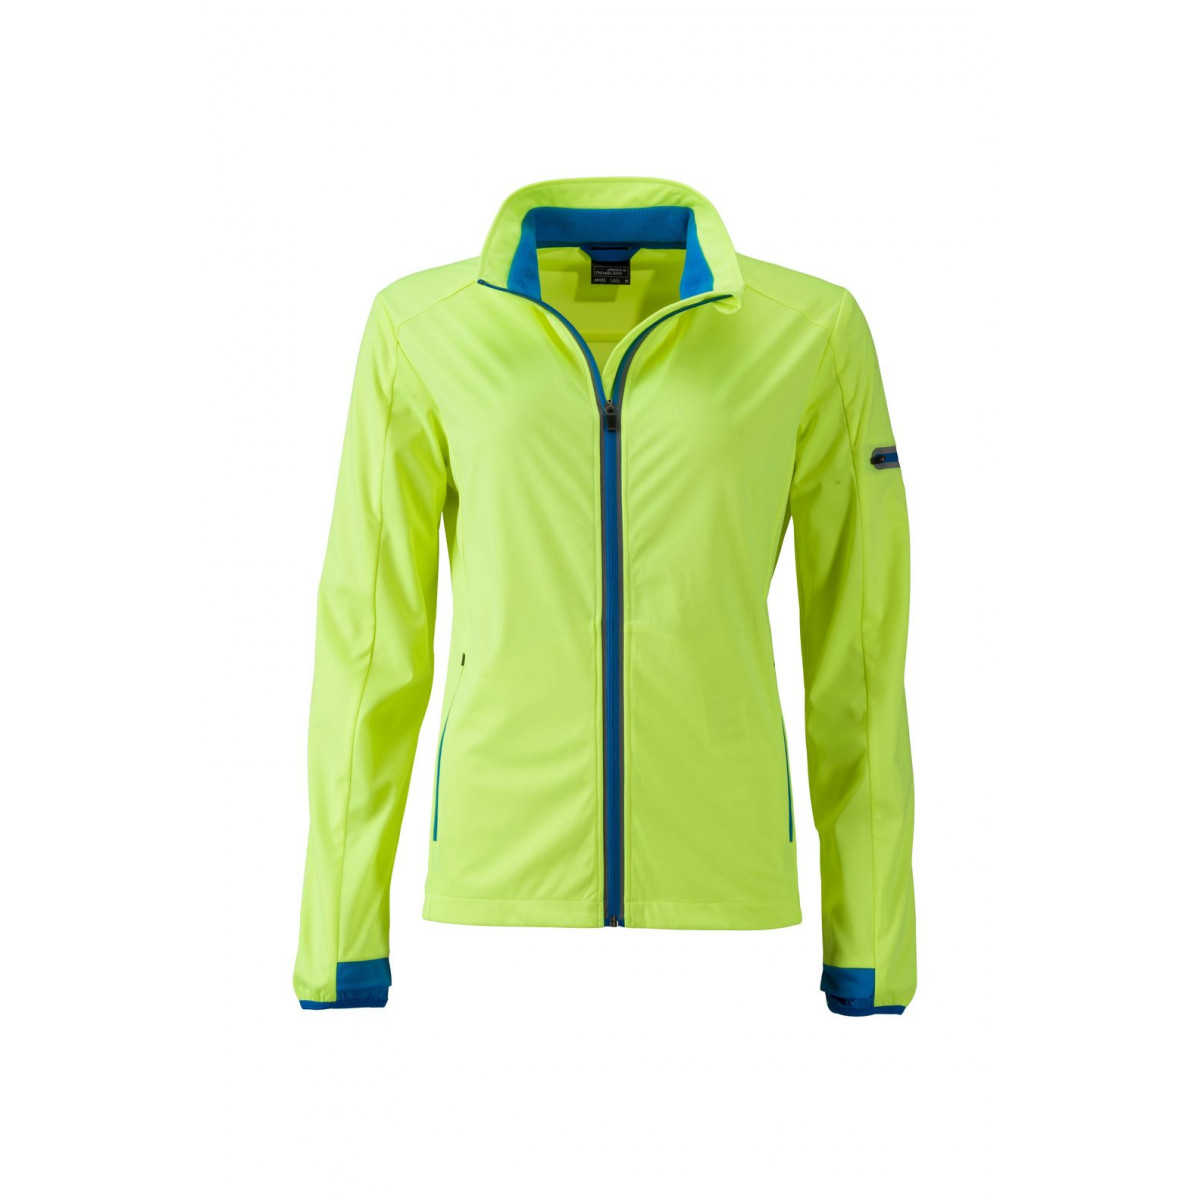 Куртка женская JN1125 Ladies Sports Softshell Jacket - Ярко-желтый/Ярко-синий